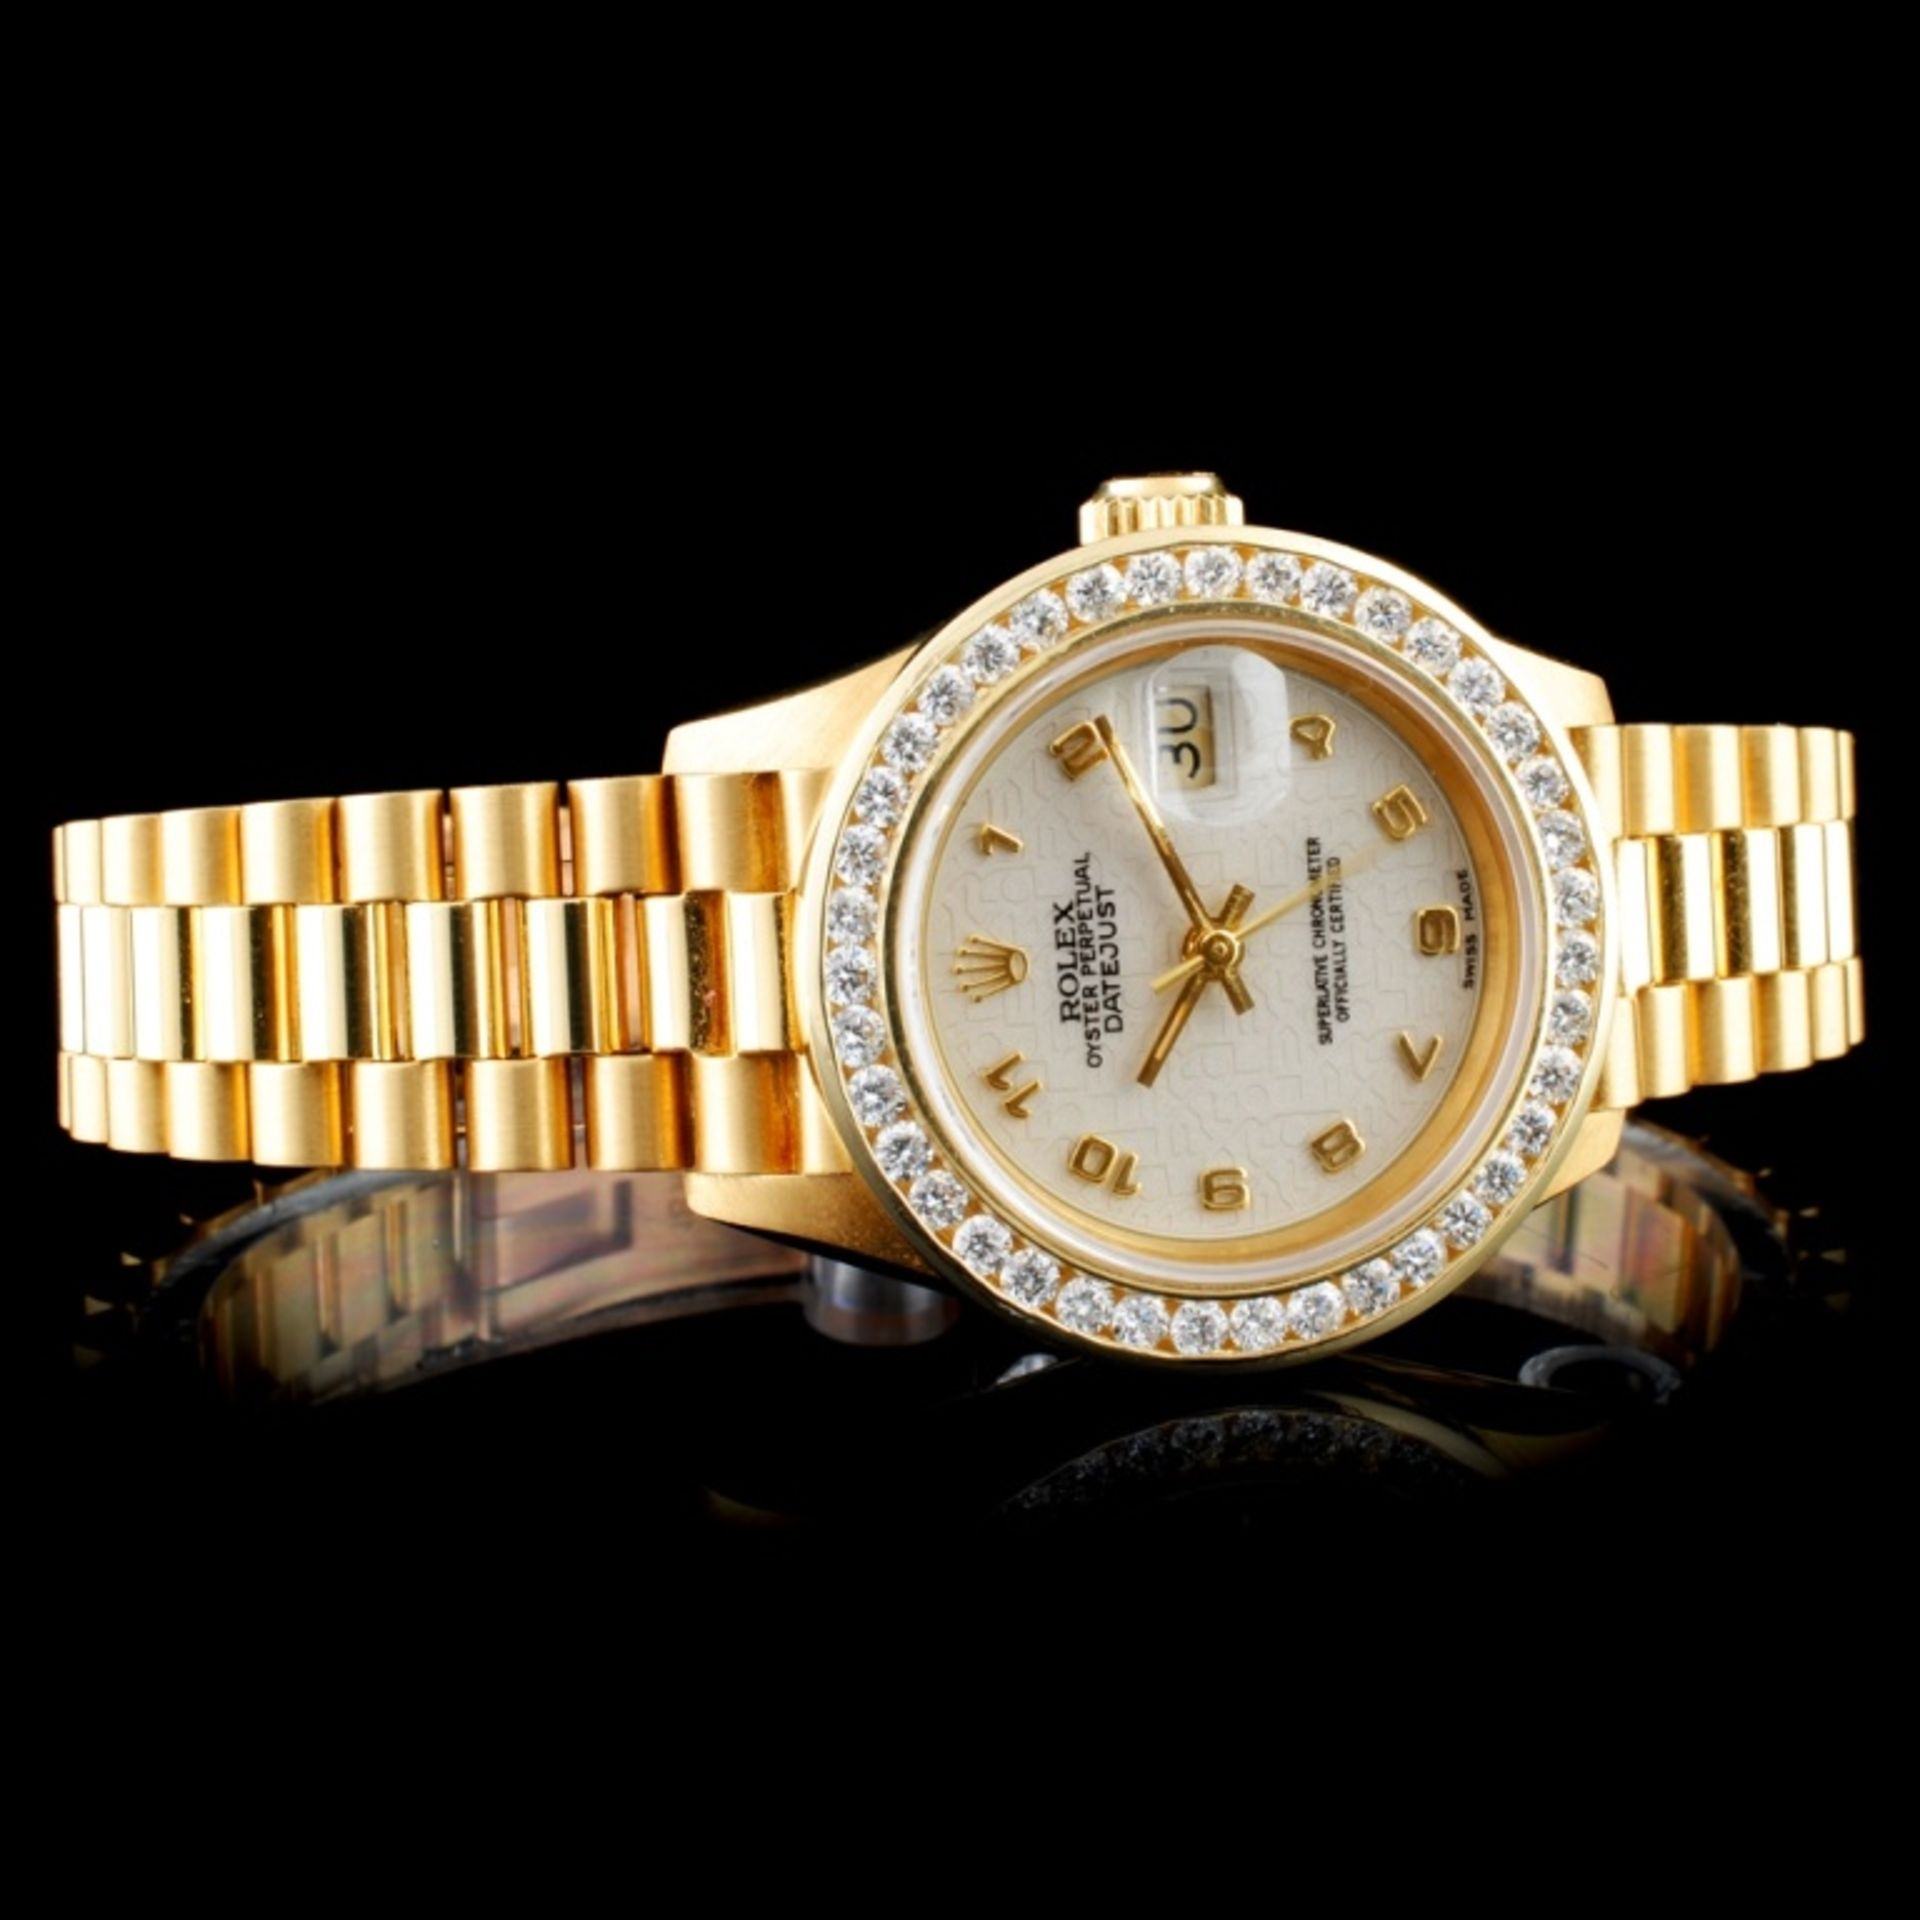 Rolex Presidential Diamond Ladies Watch - Image 2 of 6